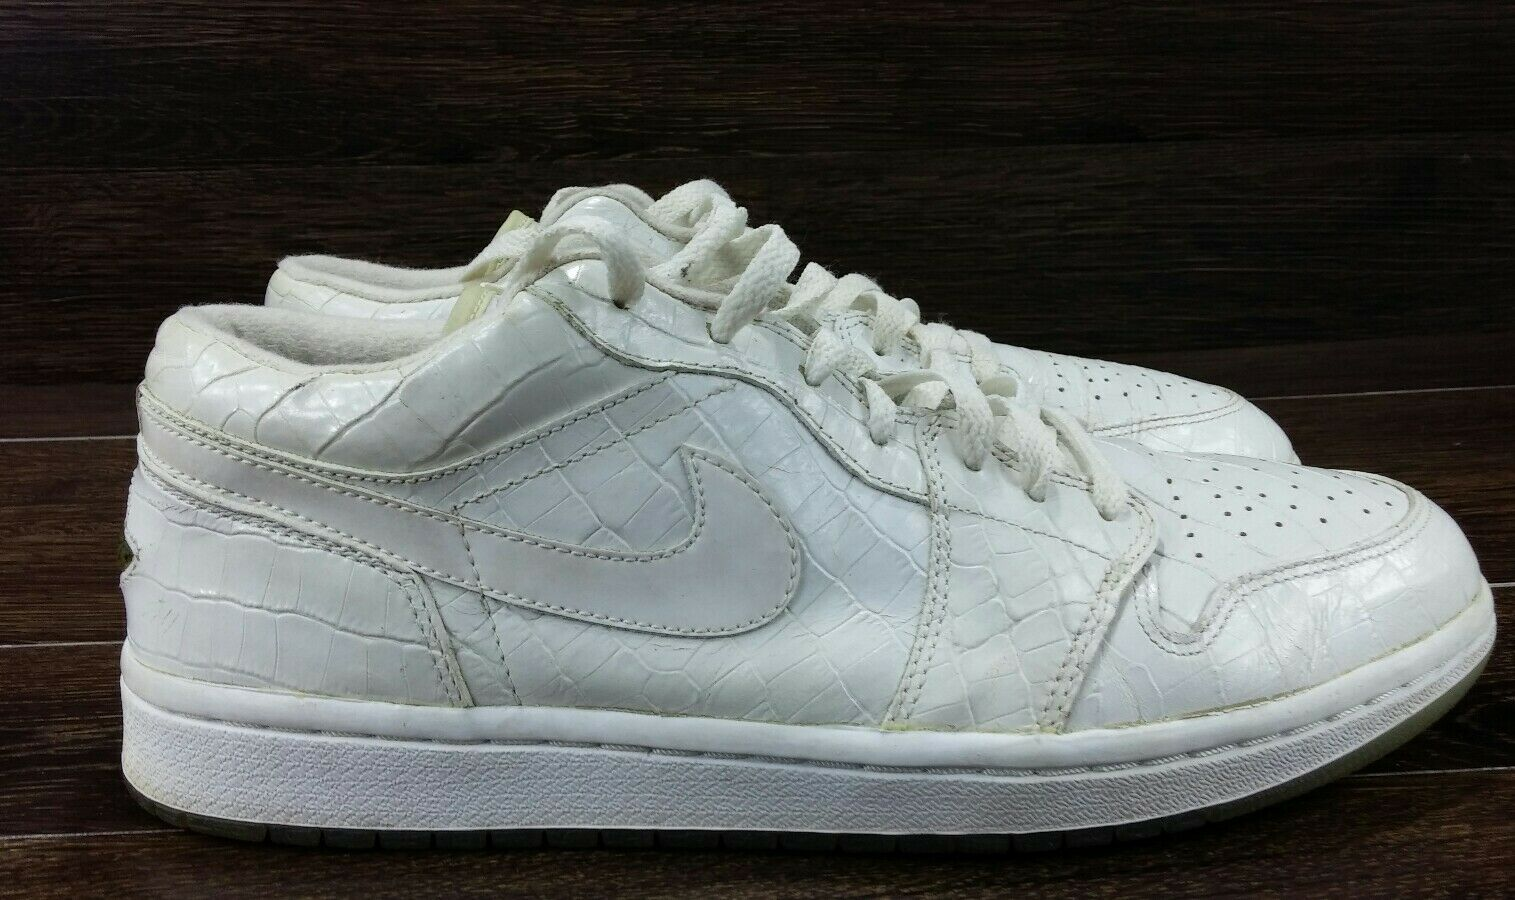 Nike Air Jordan I 1 Retro Low White White-Crocodile RARE 309192-103 Mens SZ 11